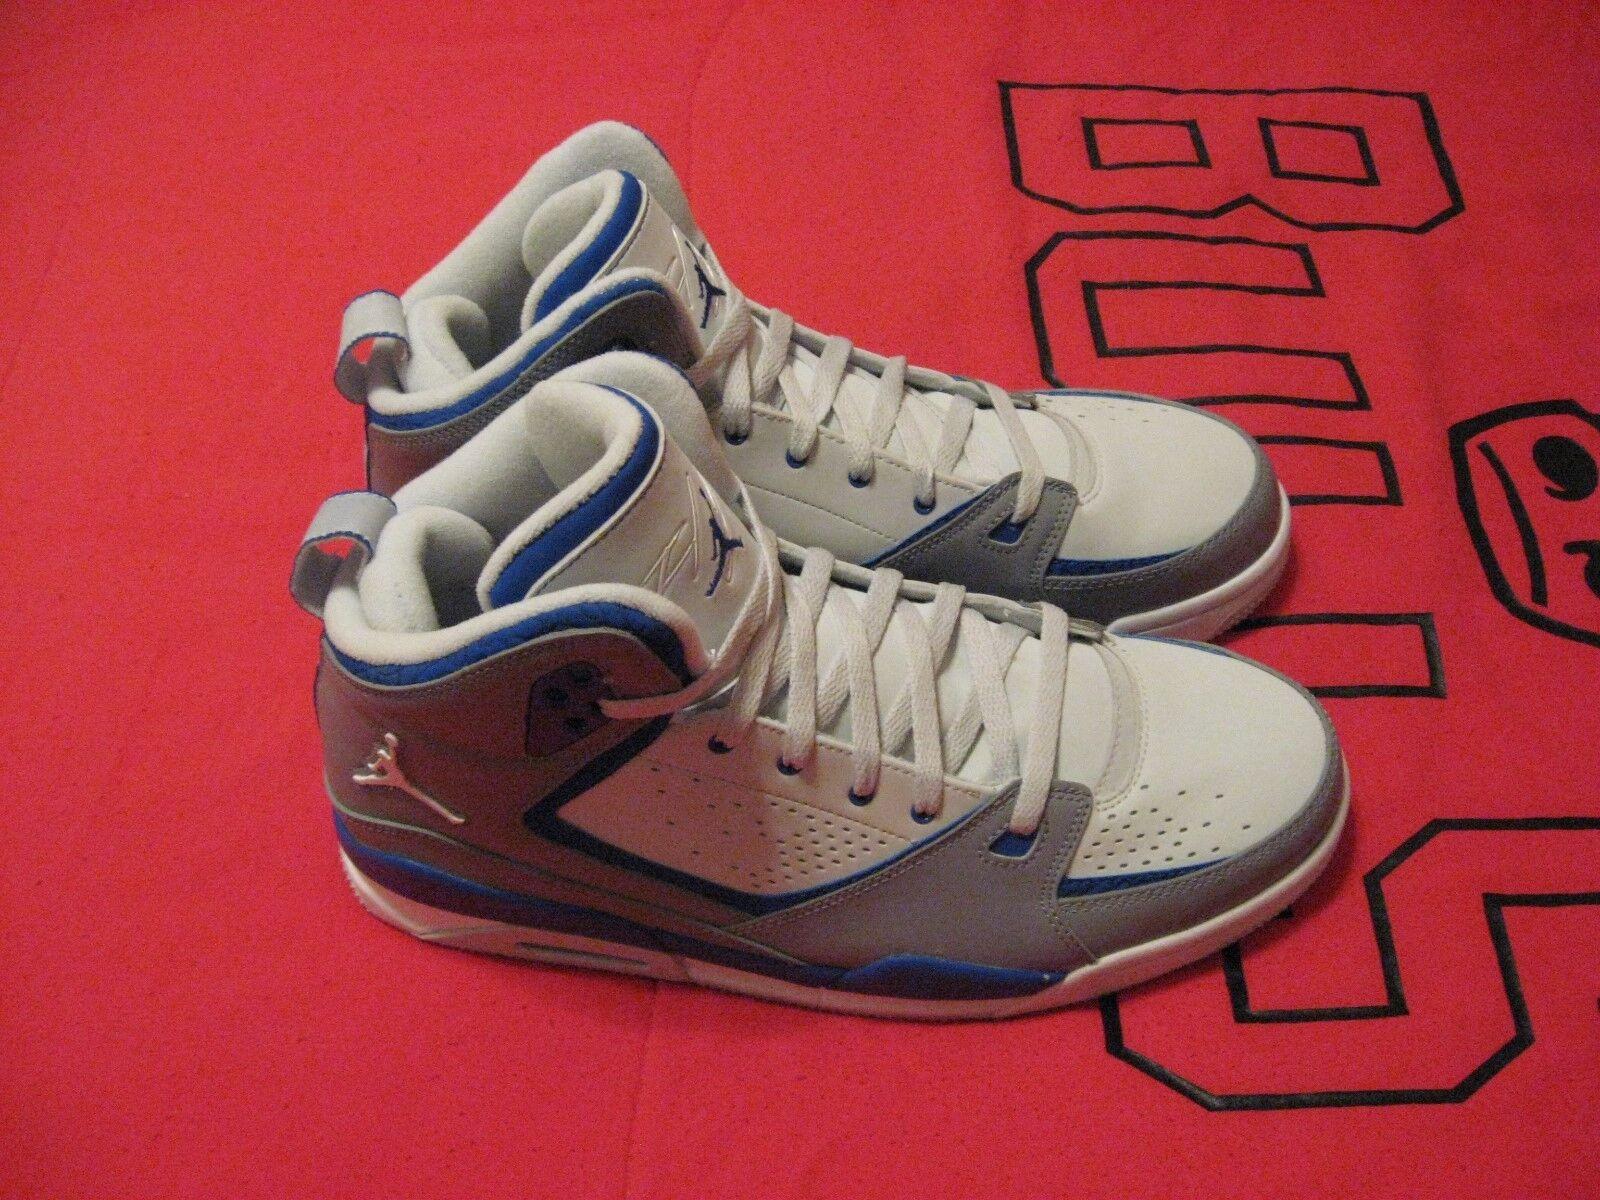 brand new gris, nike air jordan sc 2 gris, new blanc et bleu. f10175